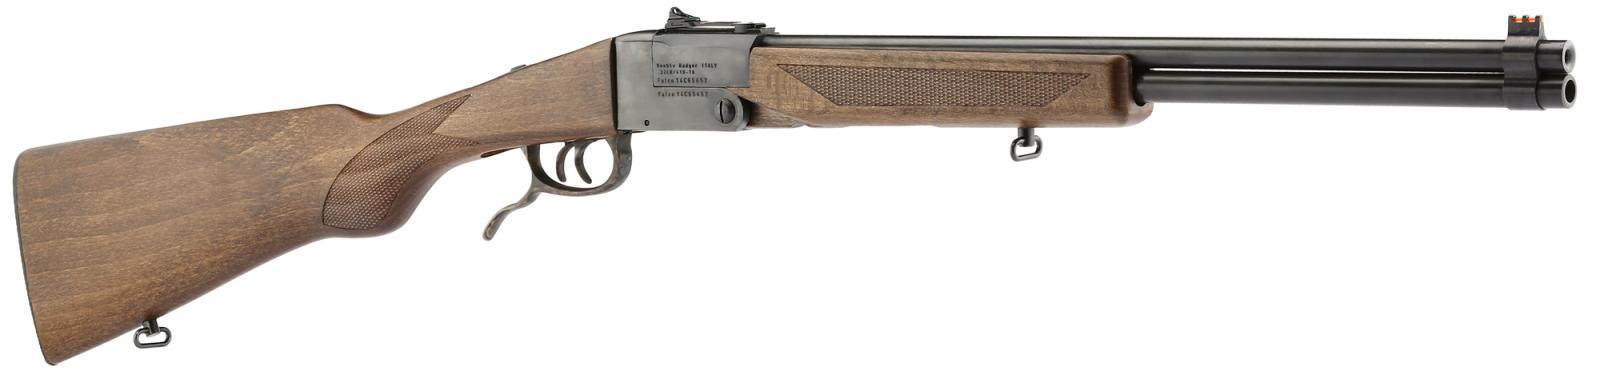 Carabine pliante superposée CHIAPPA double Badger Cal. 410 / 22 Lr